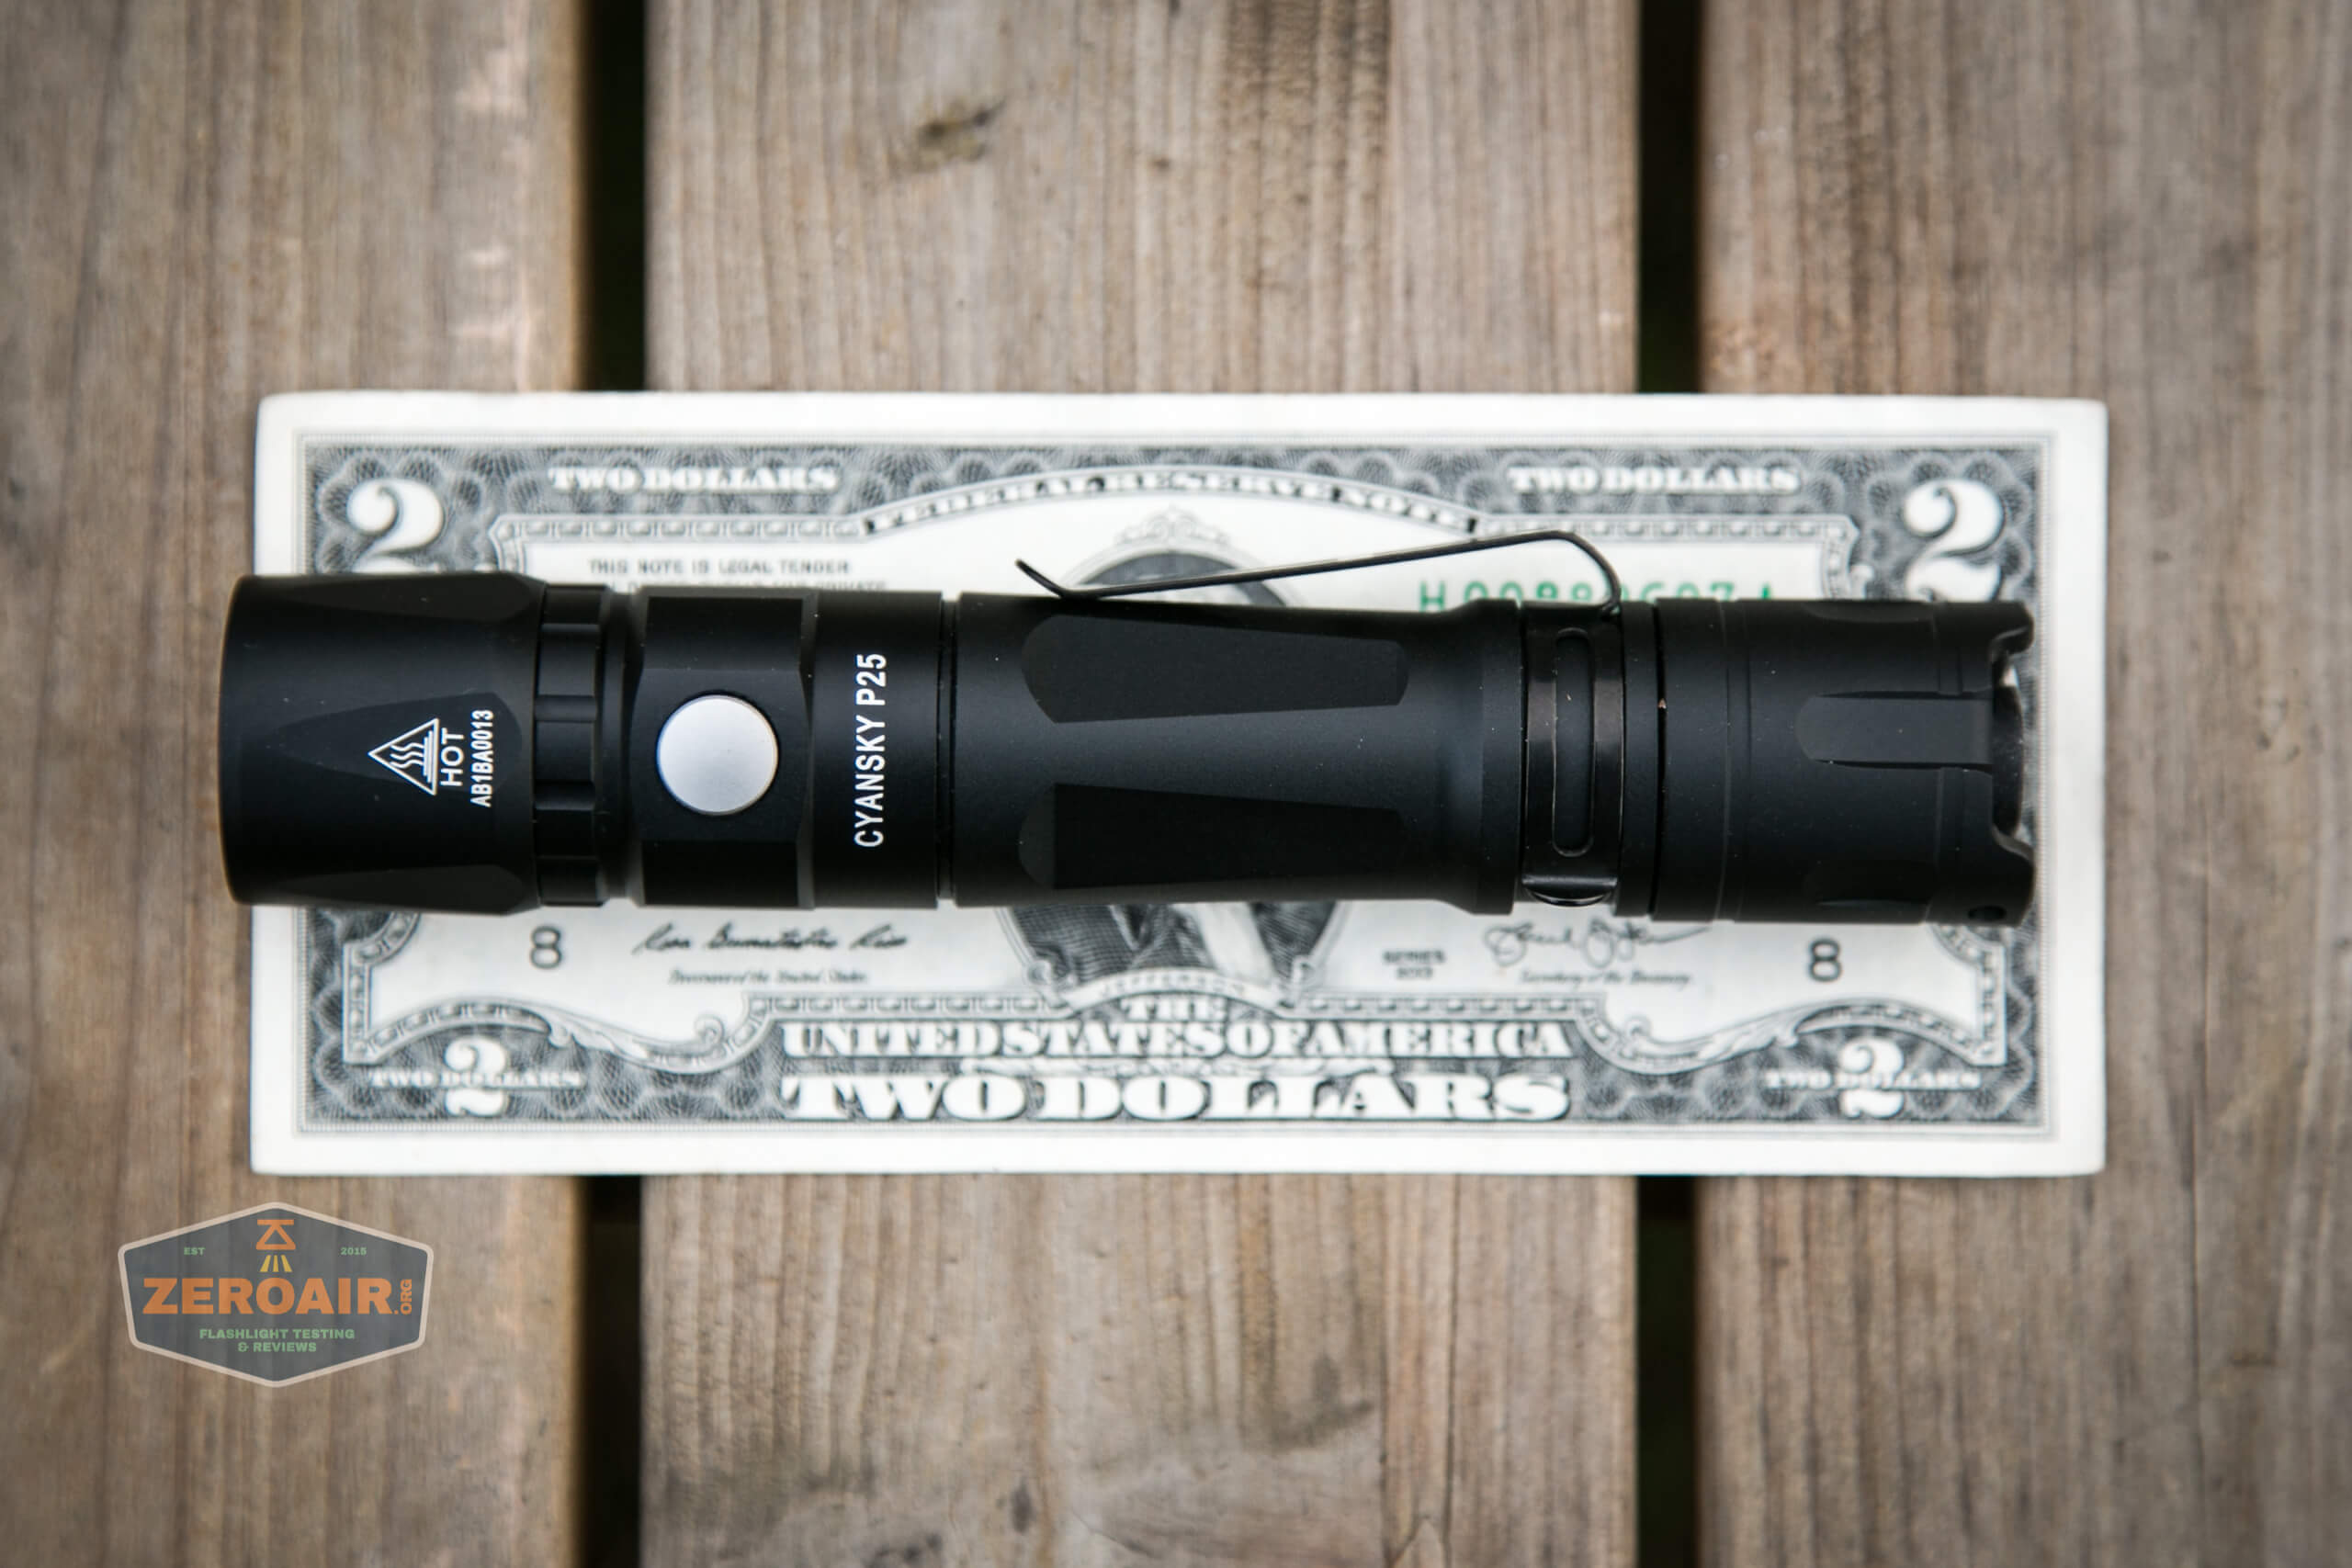 Cyansky P25 Flashlight on two dollar bill